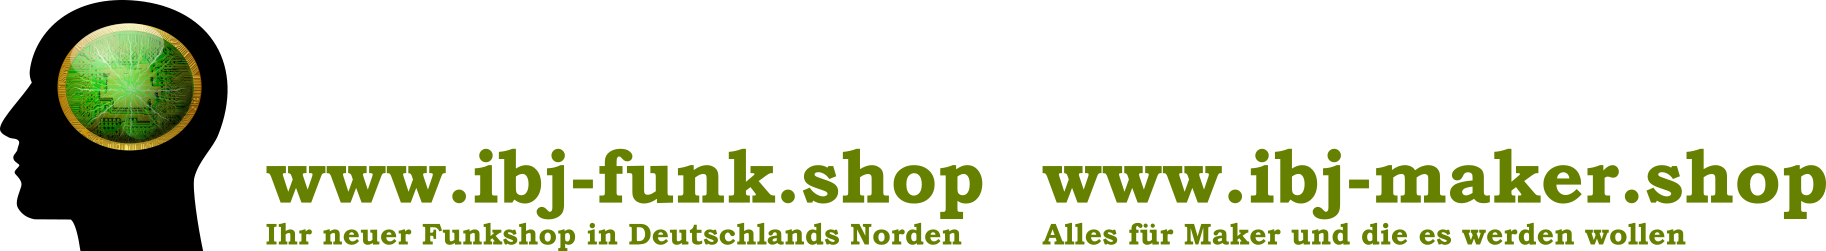 IBJ Shop Banner